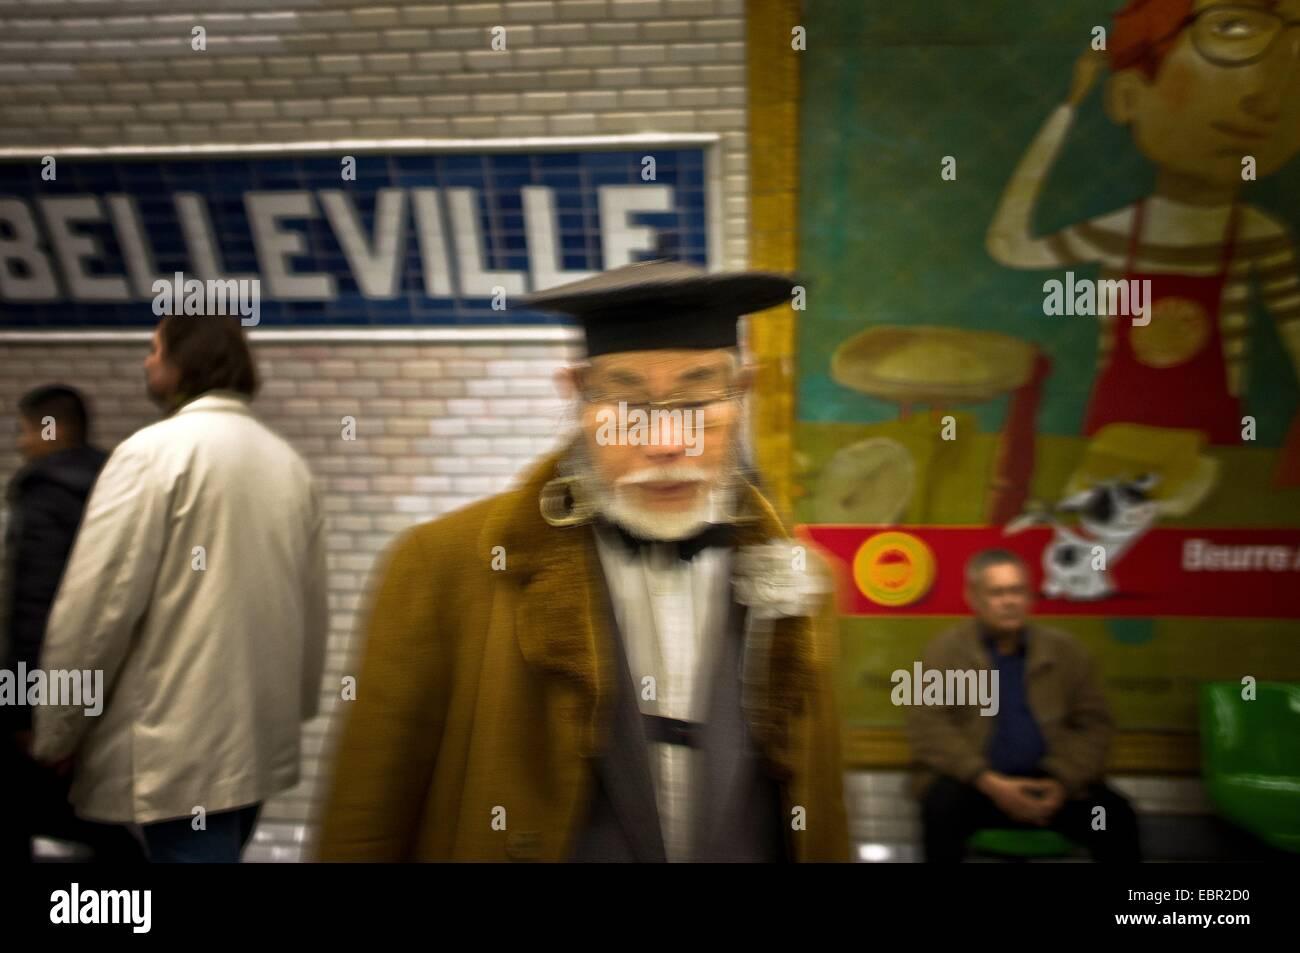 ActiveMuseum_0002401.jpg / 'Belleville' subway station in one shot. Mr Morimoto 25/02/2012  -   Sylvain - Stock Image